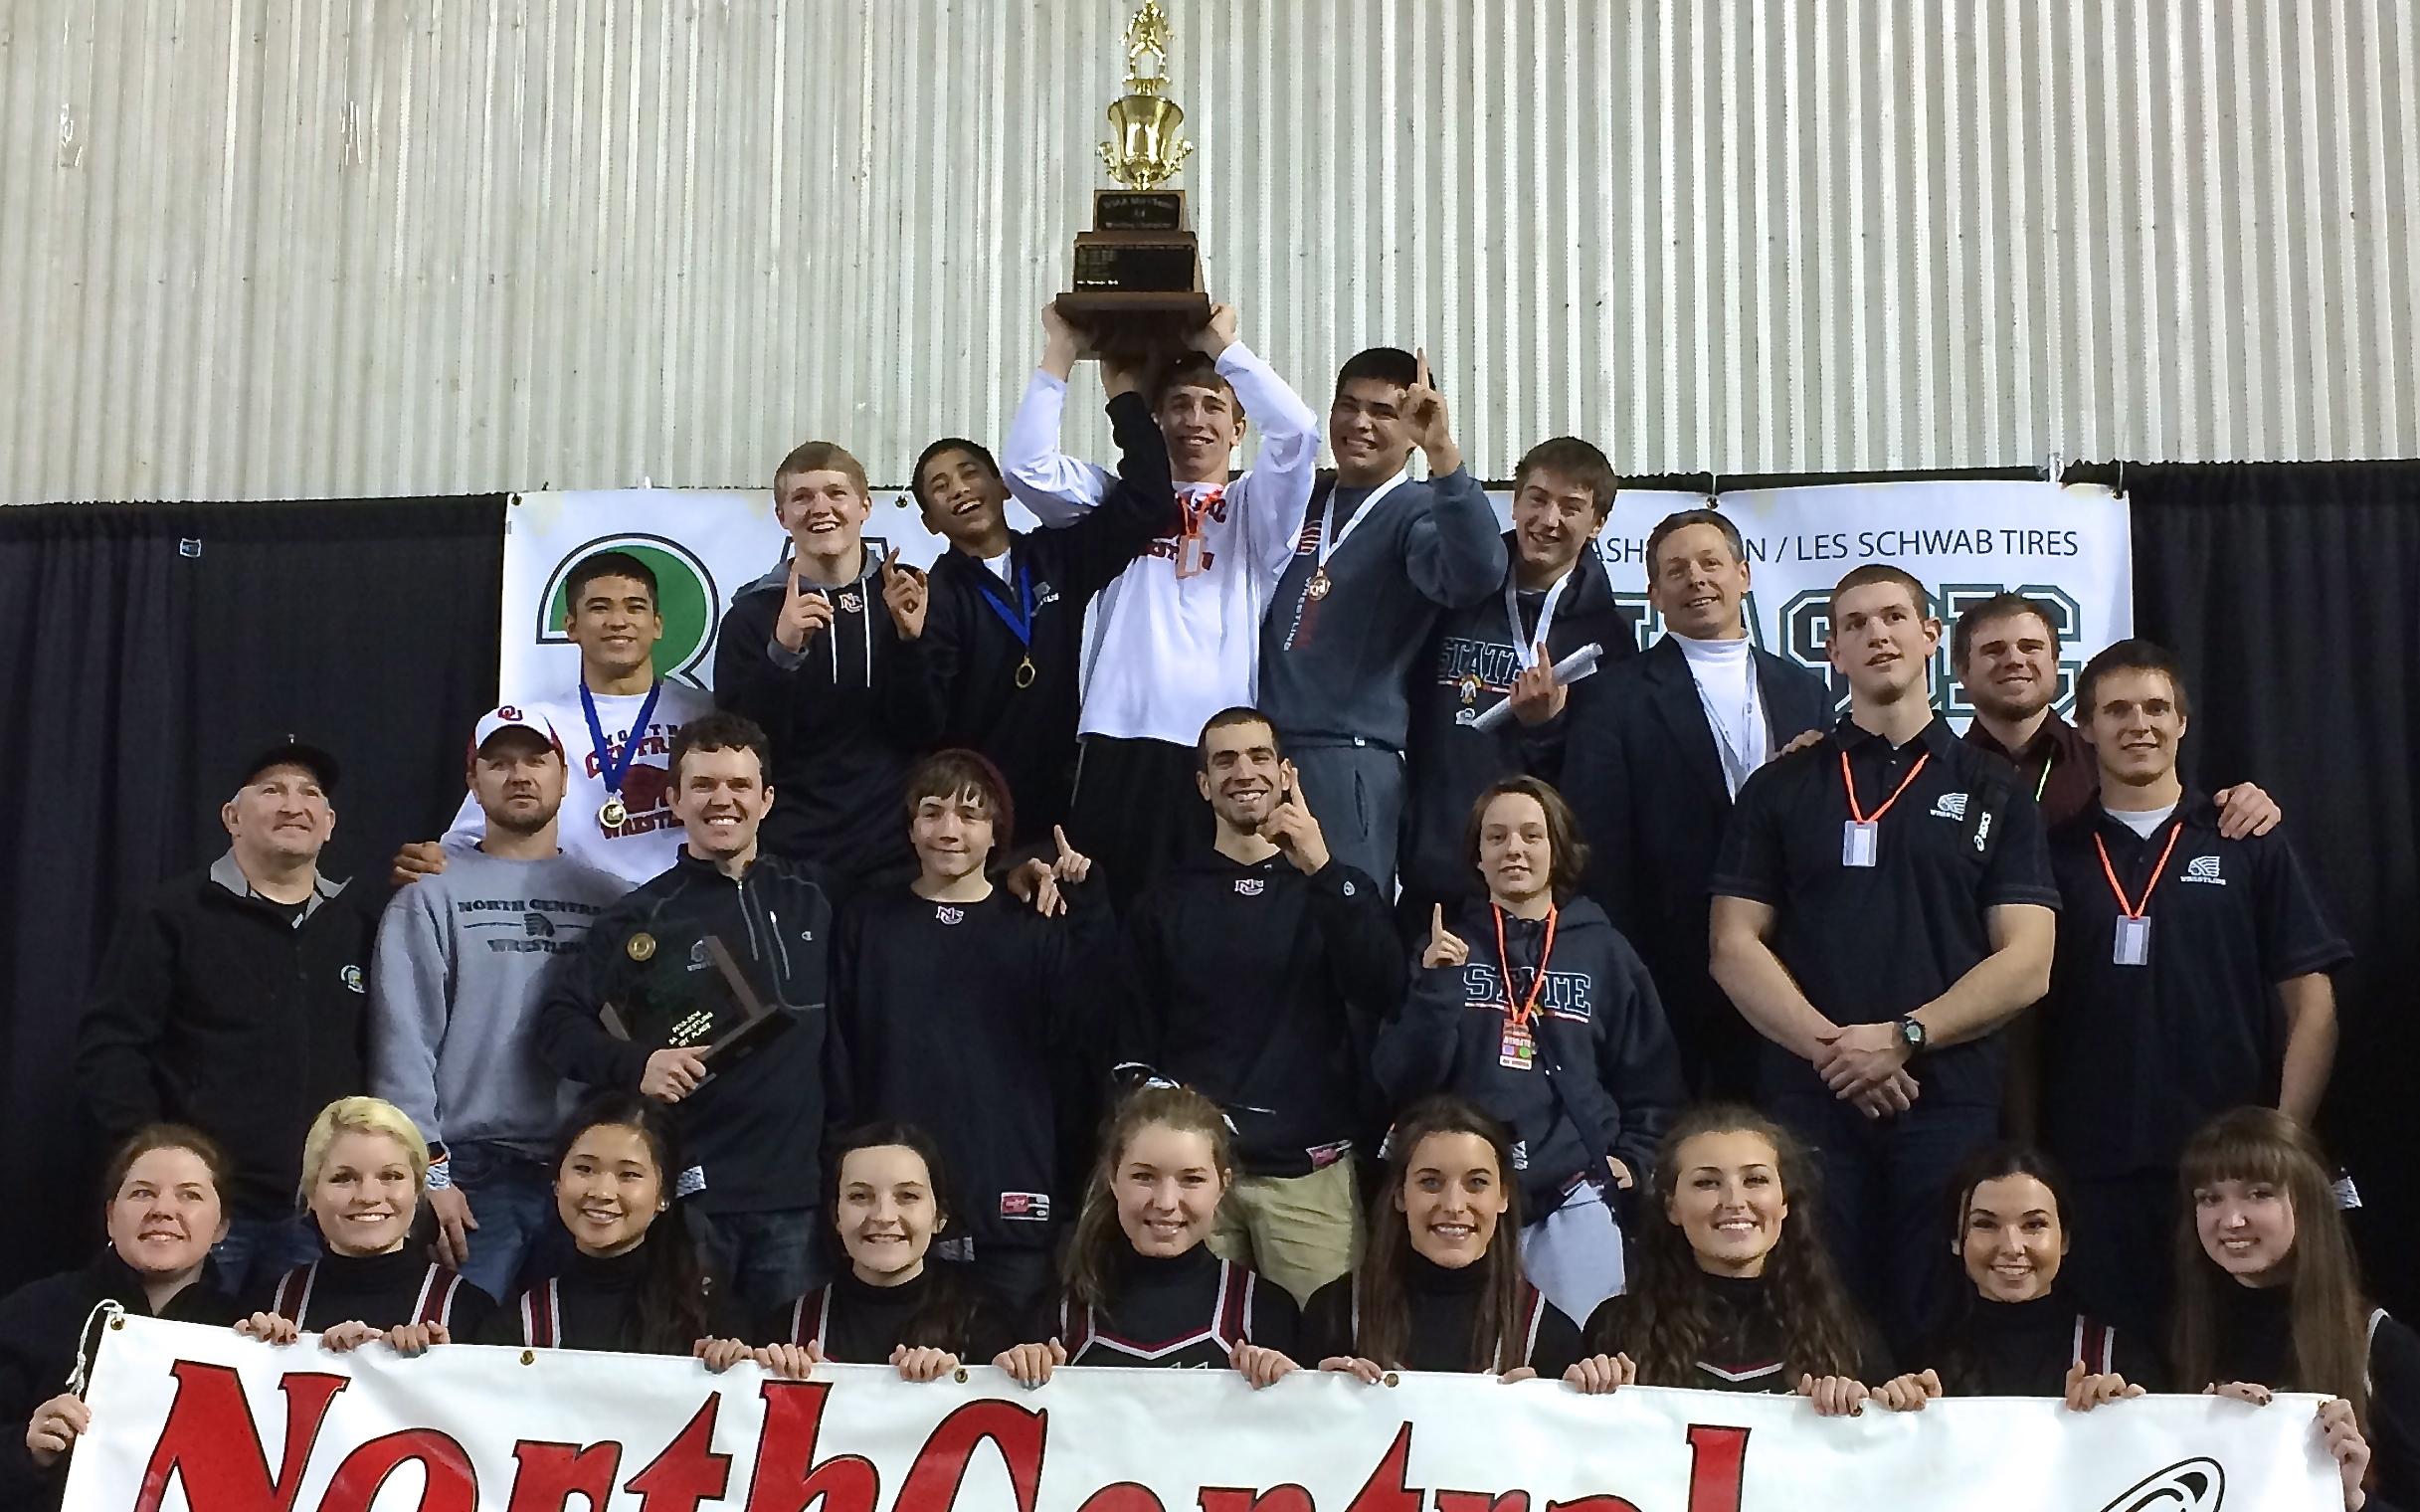 2014 State Team Champions